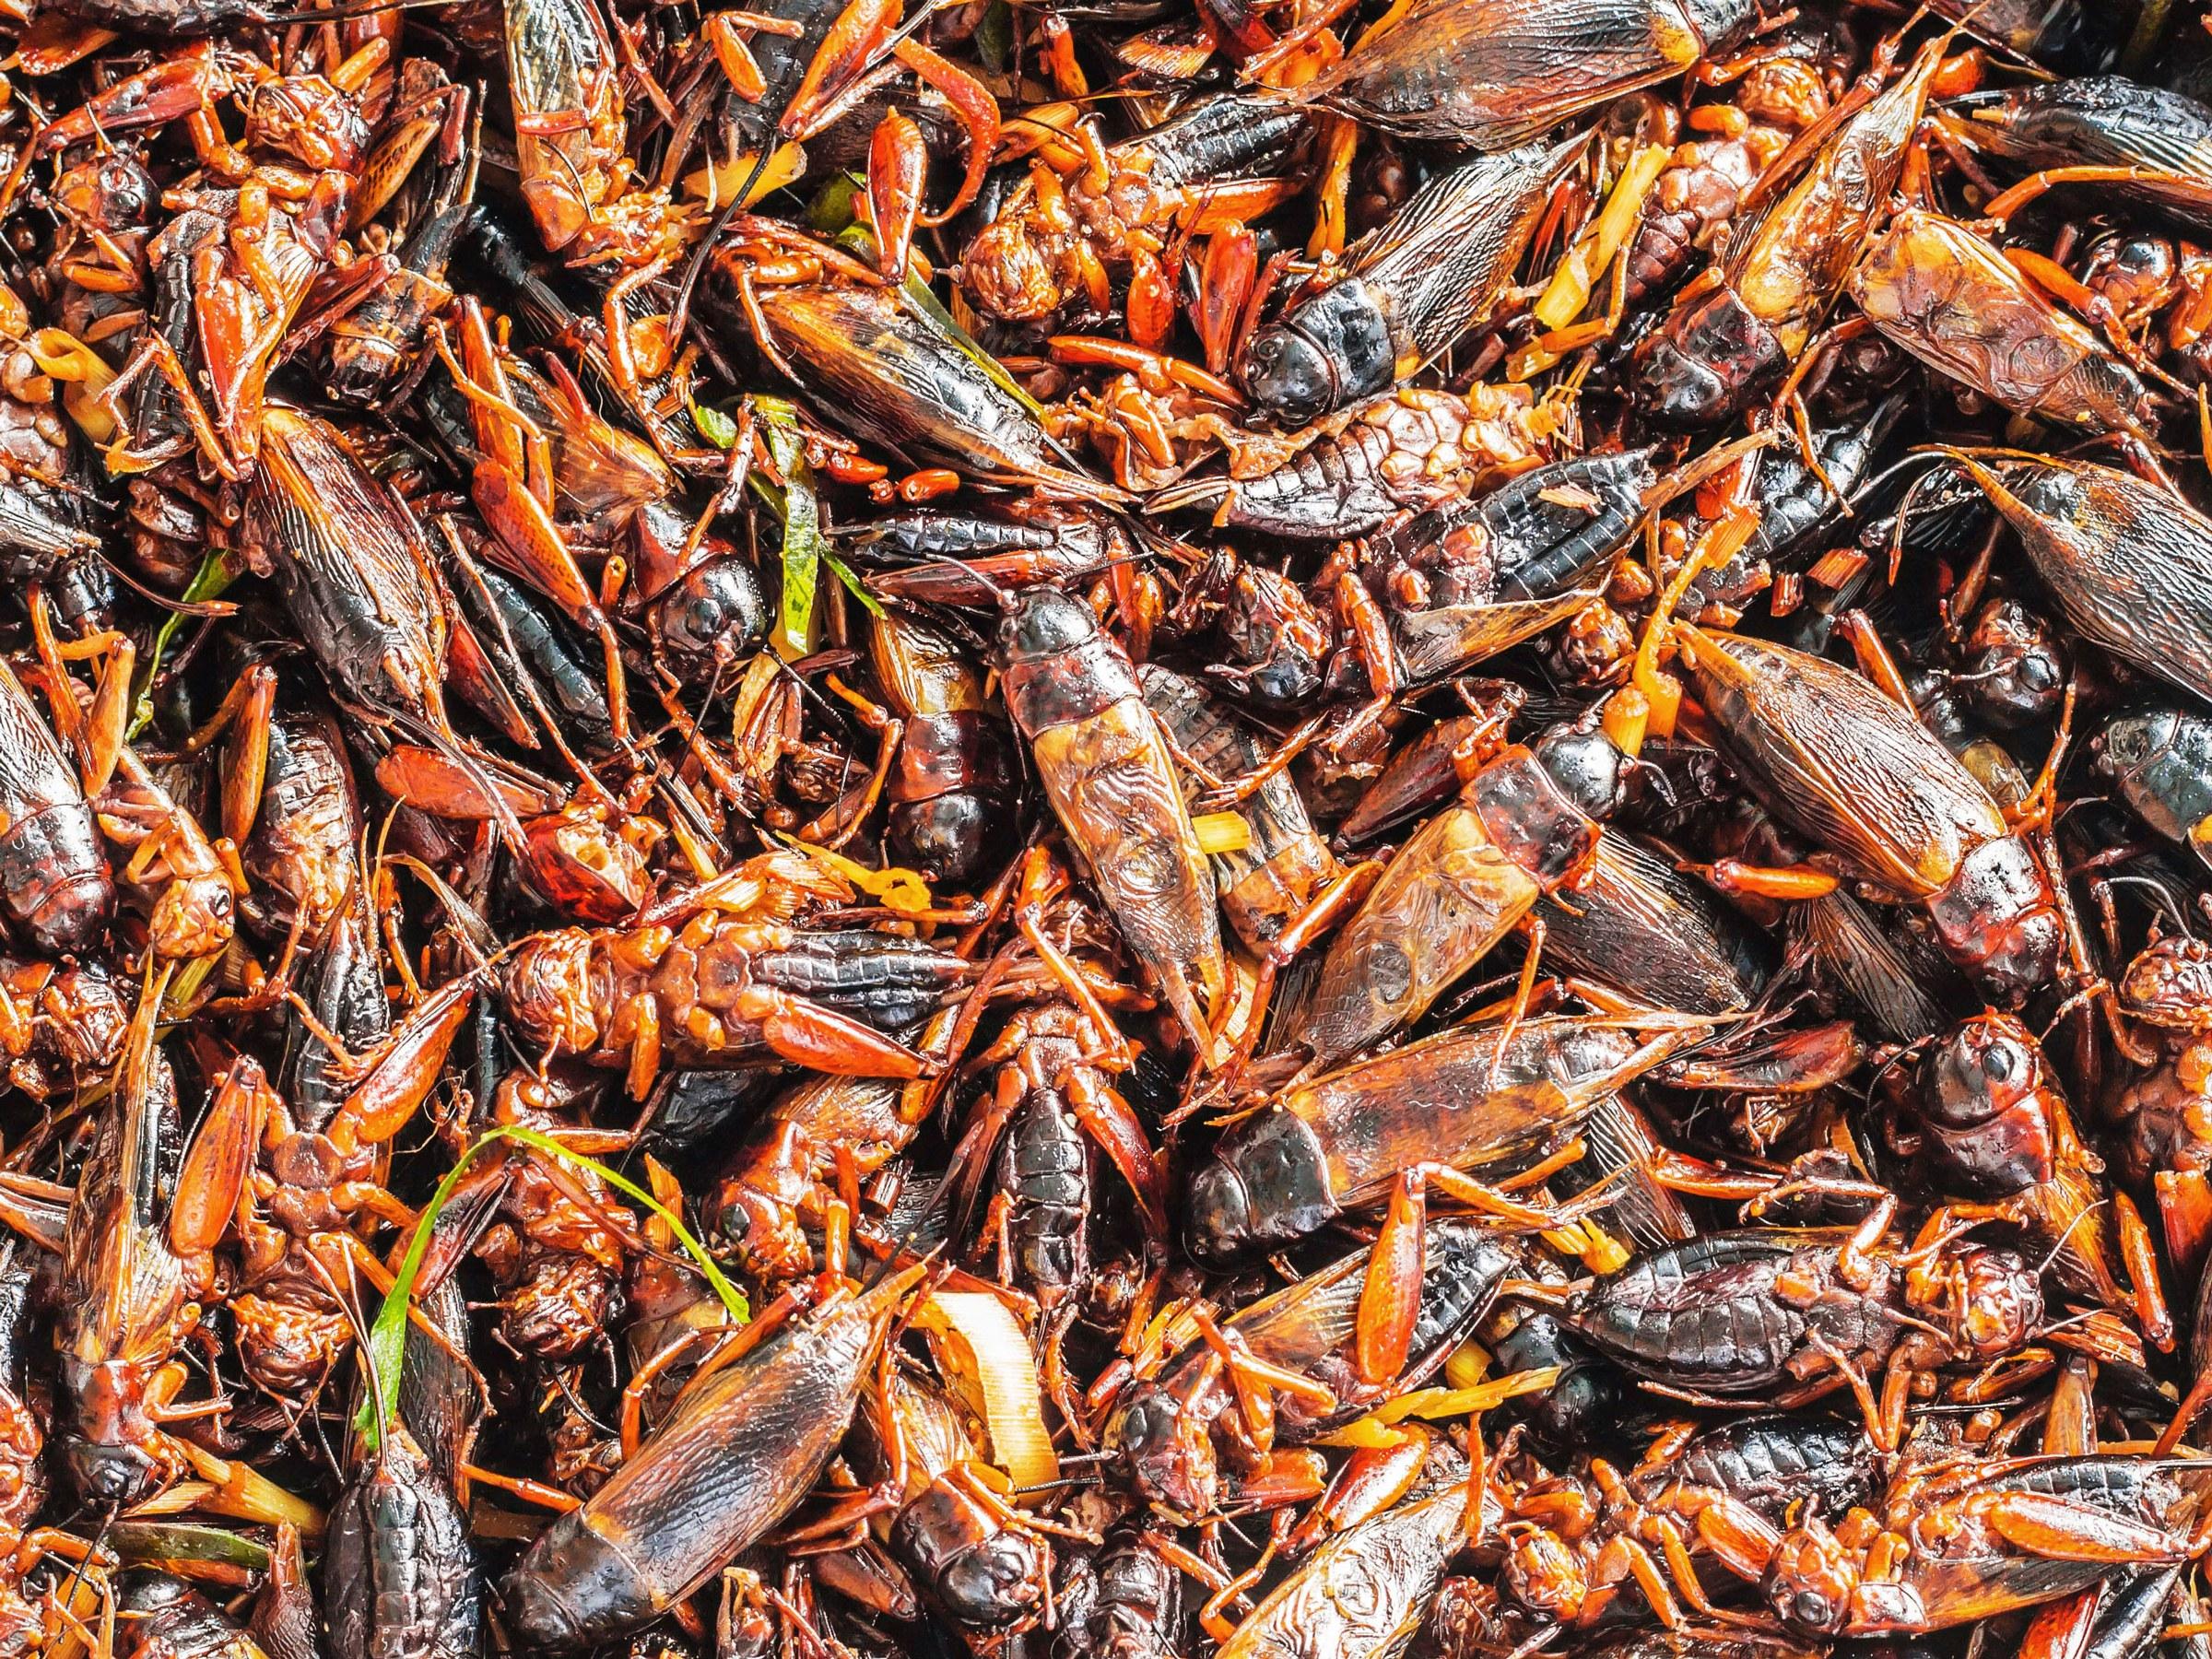 Abokado adds crickets to its food menu in London